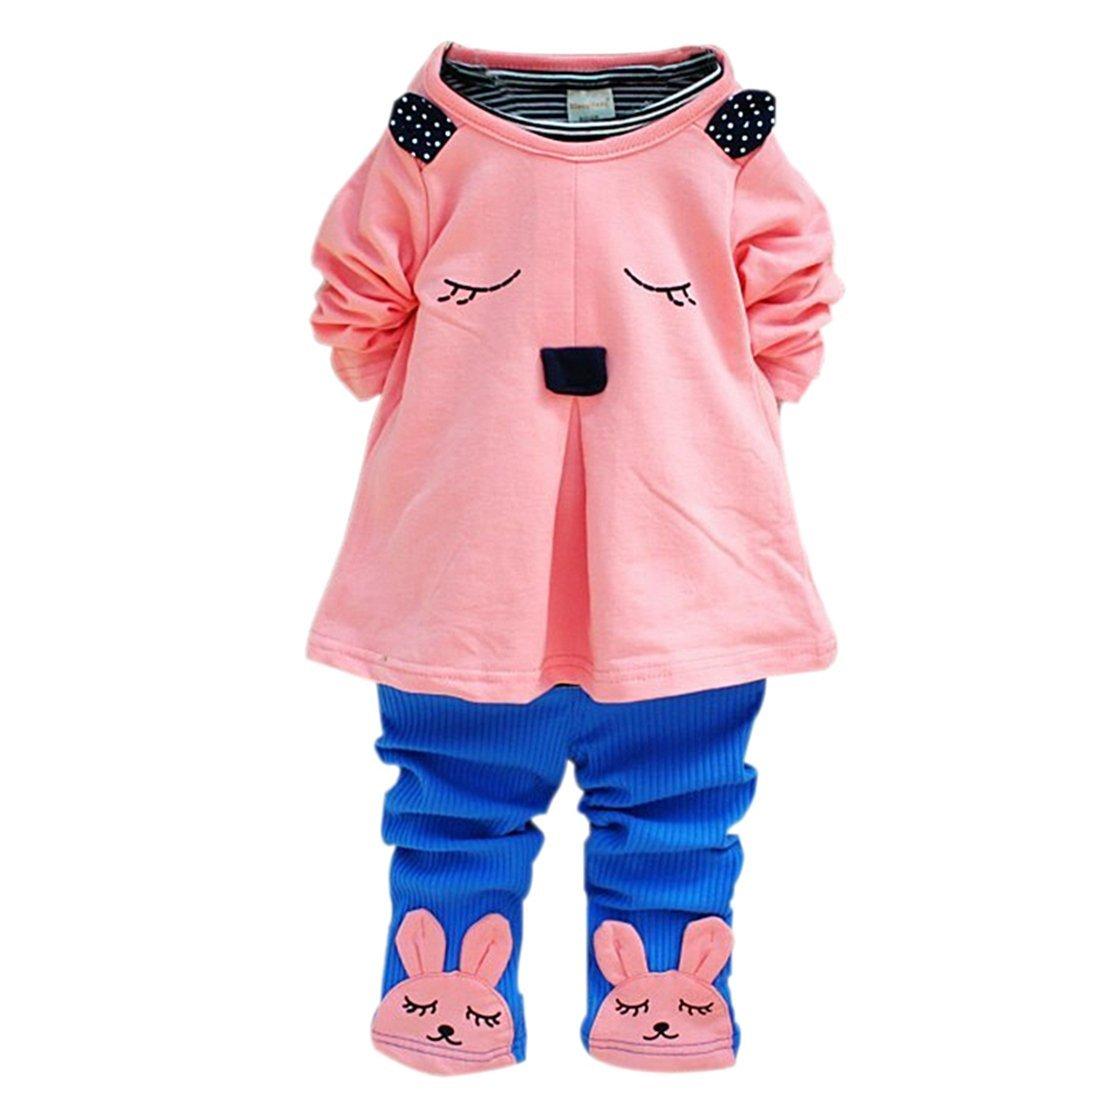 Bunny Rabbit Suit - SODIAL(R)Baby Girls Kid Princess Bunny Rabbit Suit T-Shirt Clothes Pants Outfit 2PC Set Pink 6-12m